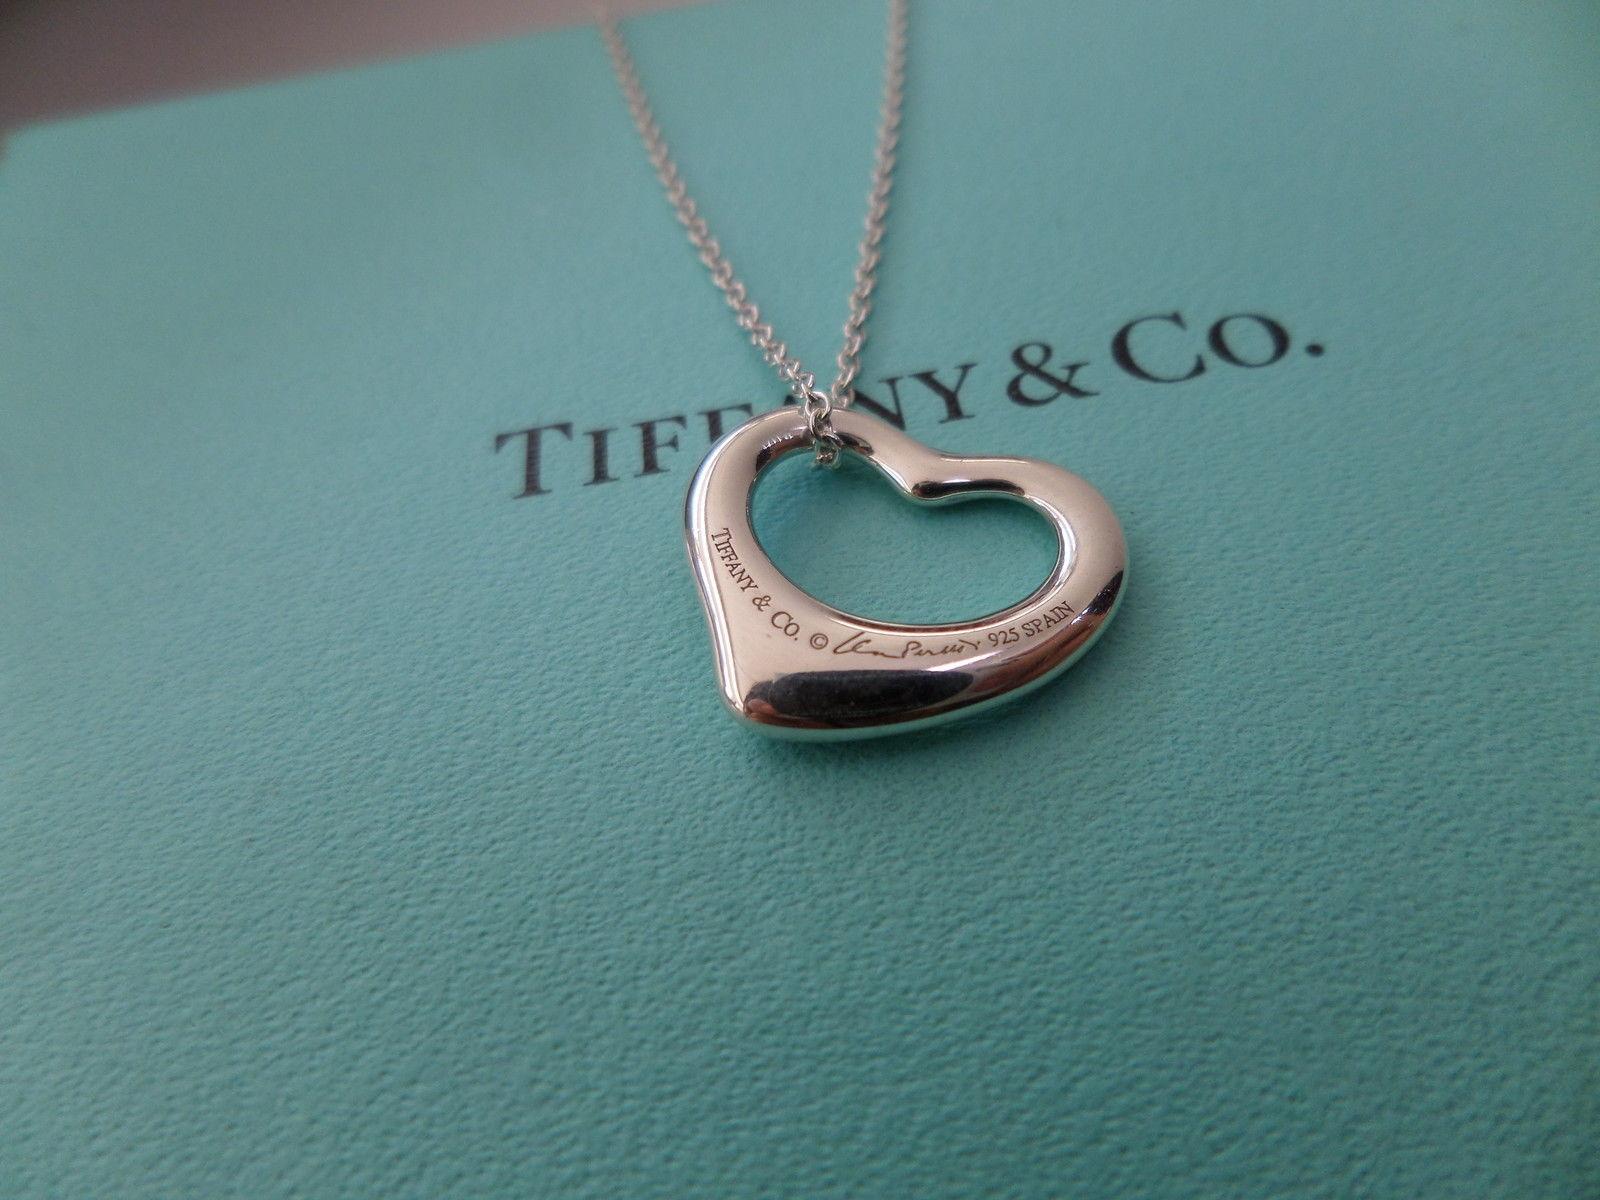 Tiffany-Co-Sterling-Silver-Elsa-Peretti-16mm-_57.jpg